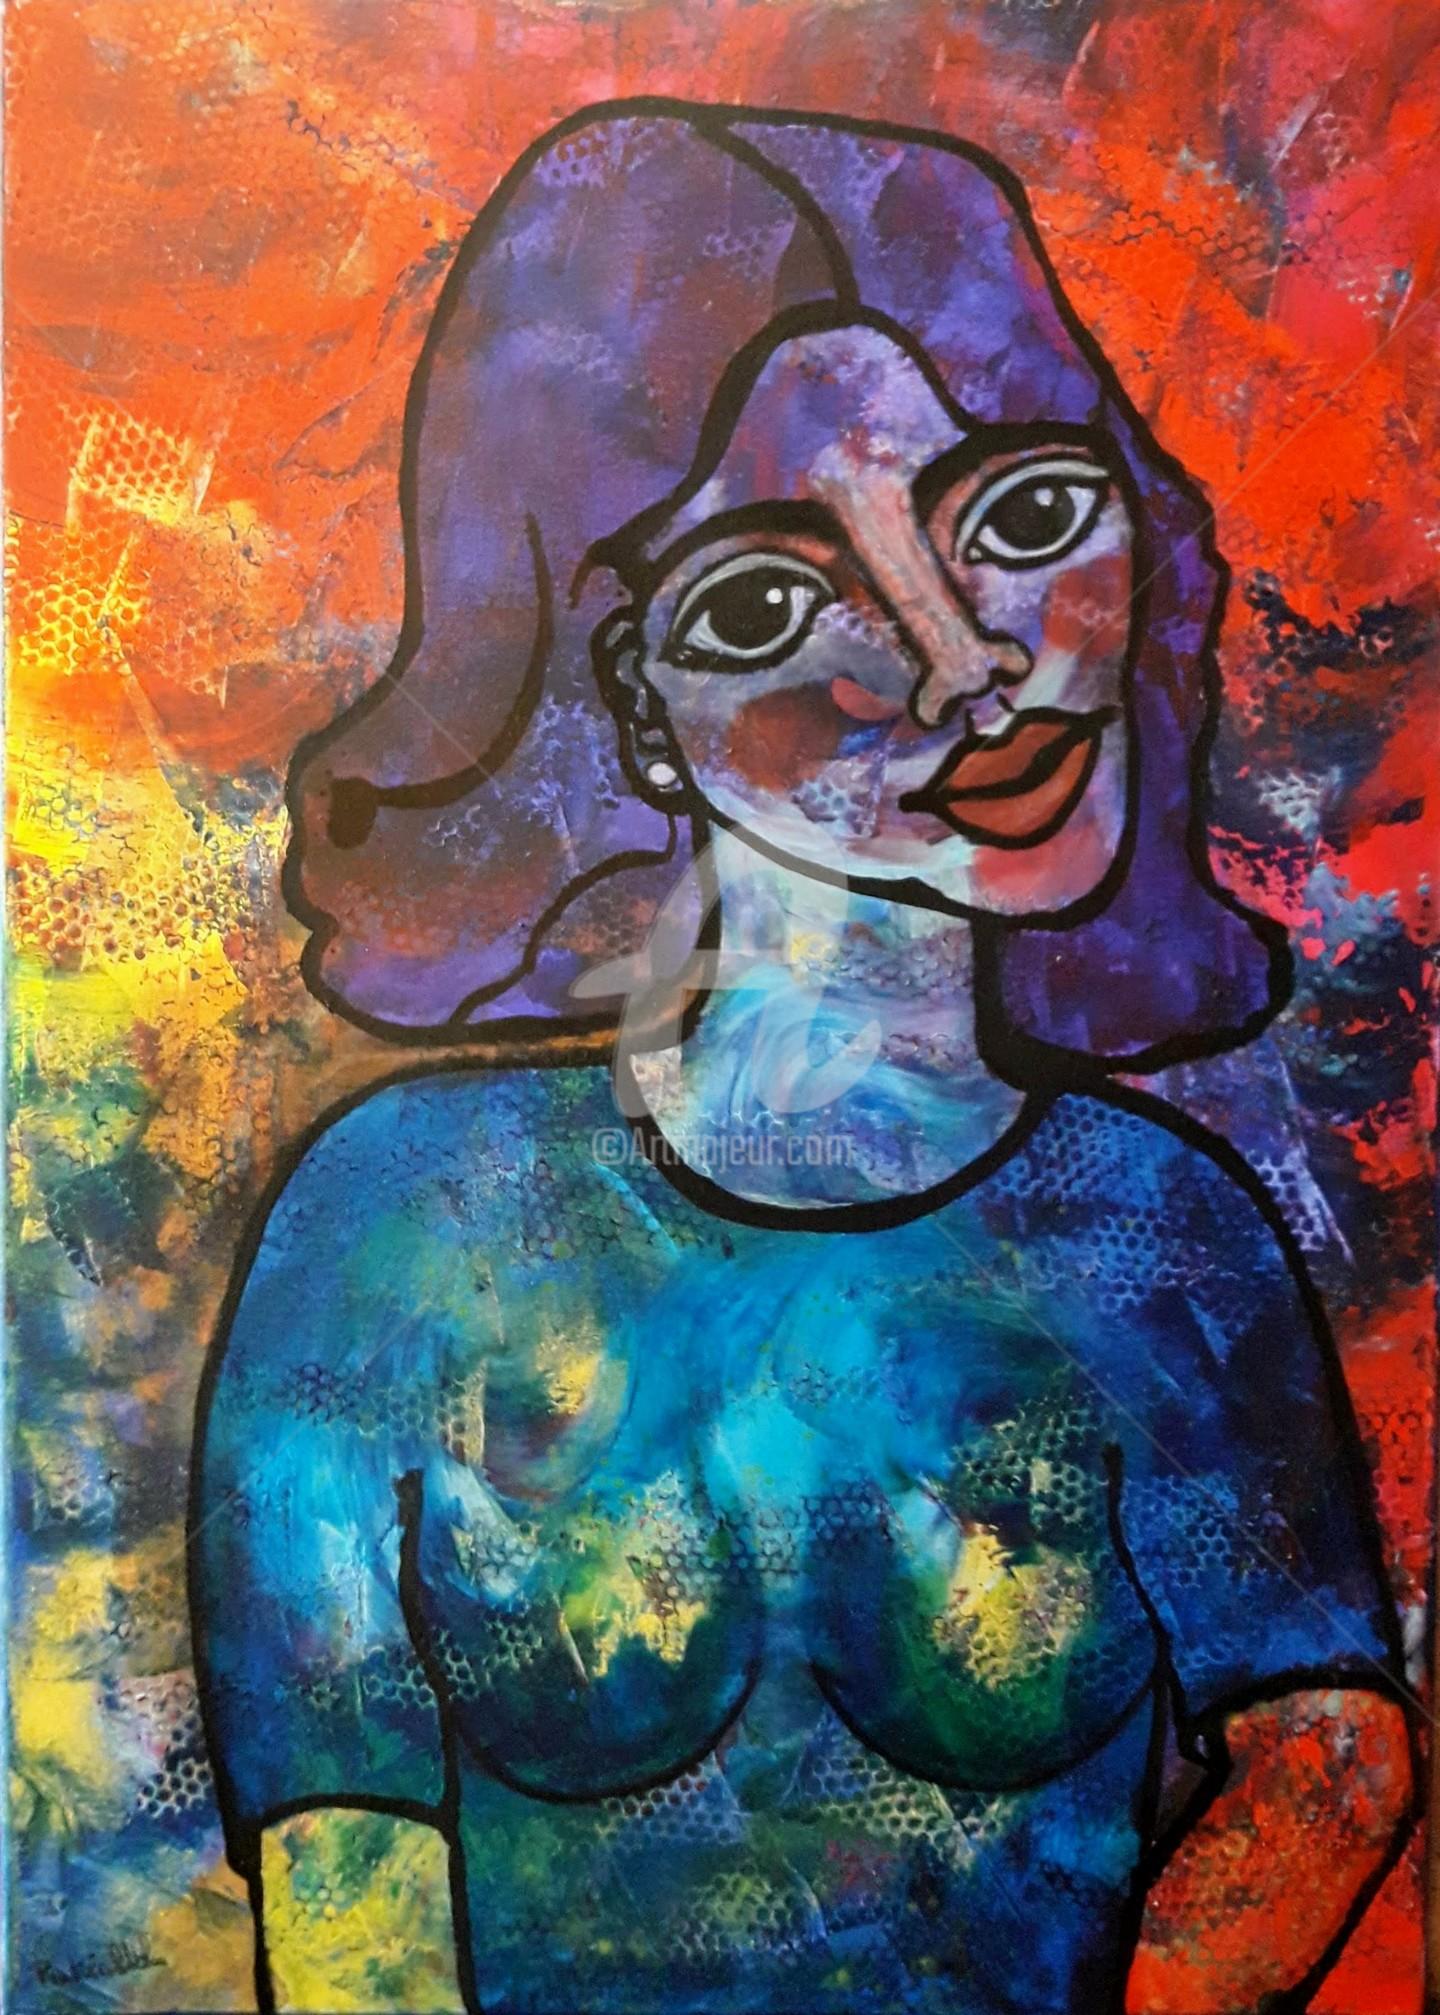 Pinkivioletblue ~ Pkvb - La demoiselle au tee-shirt bleu